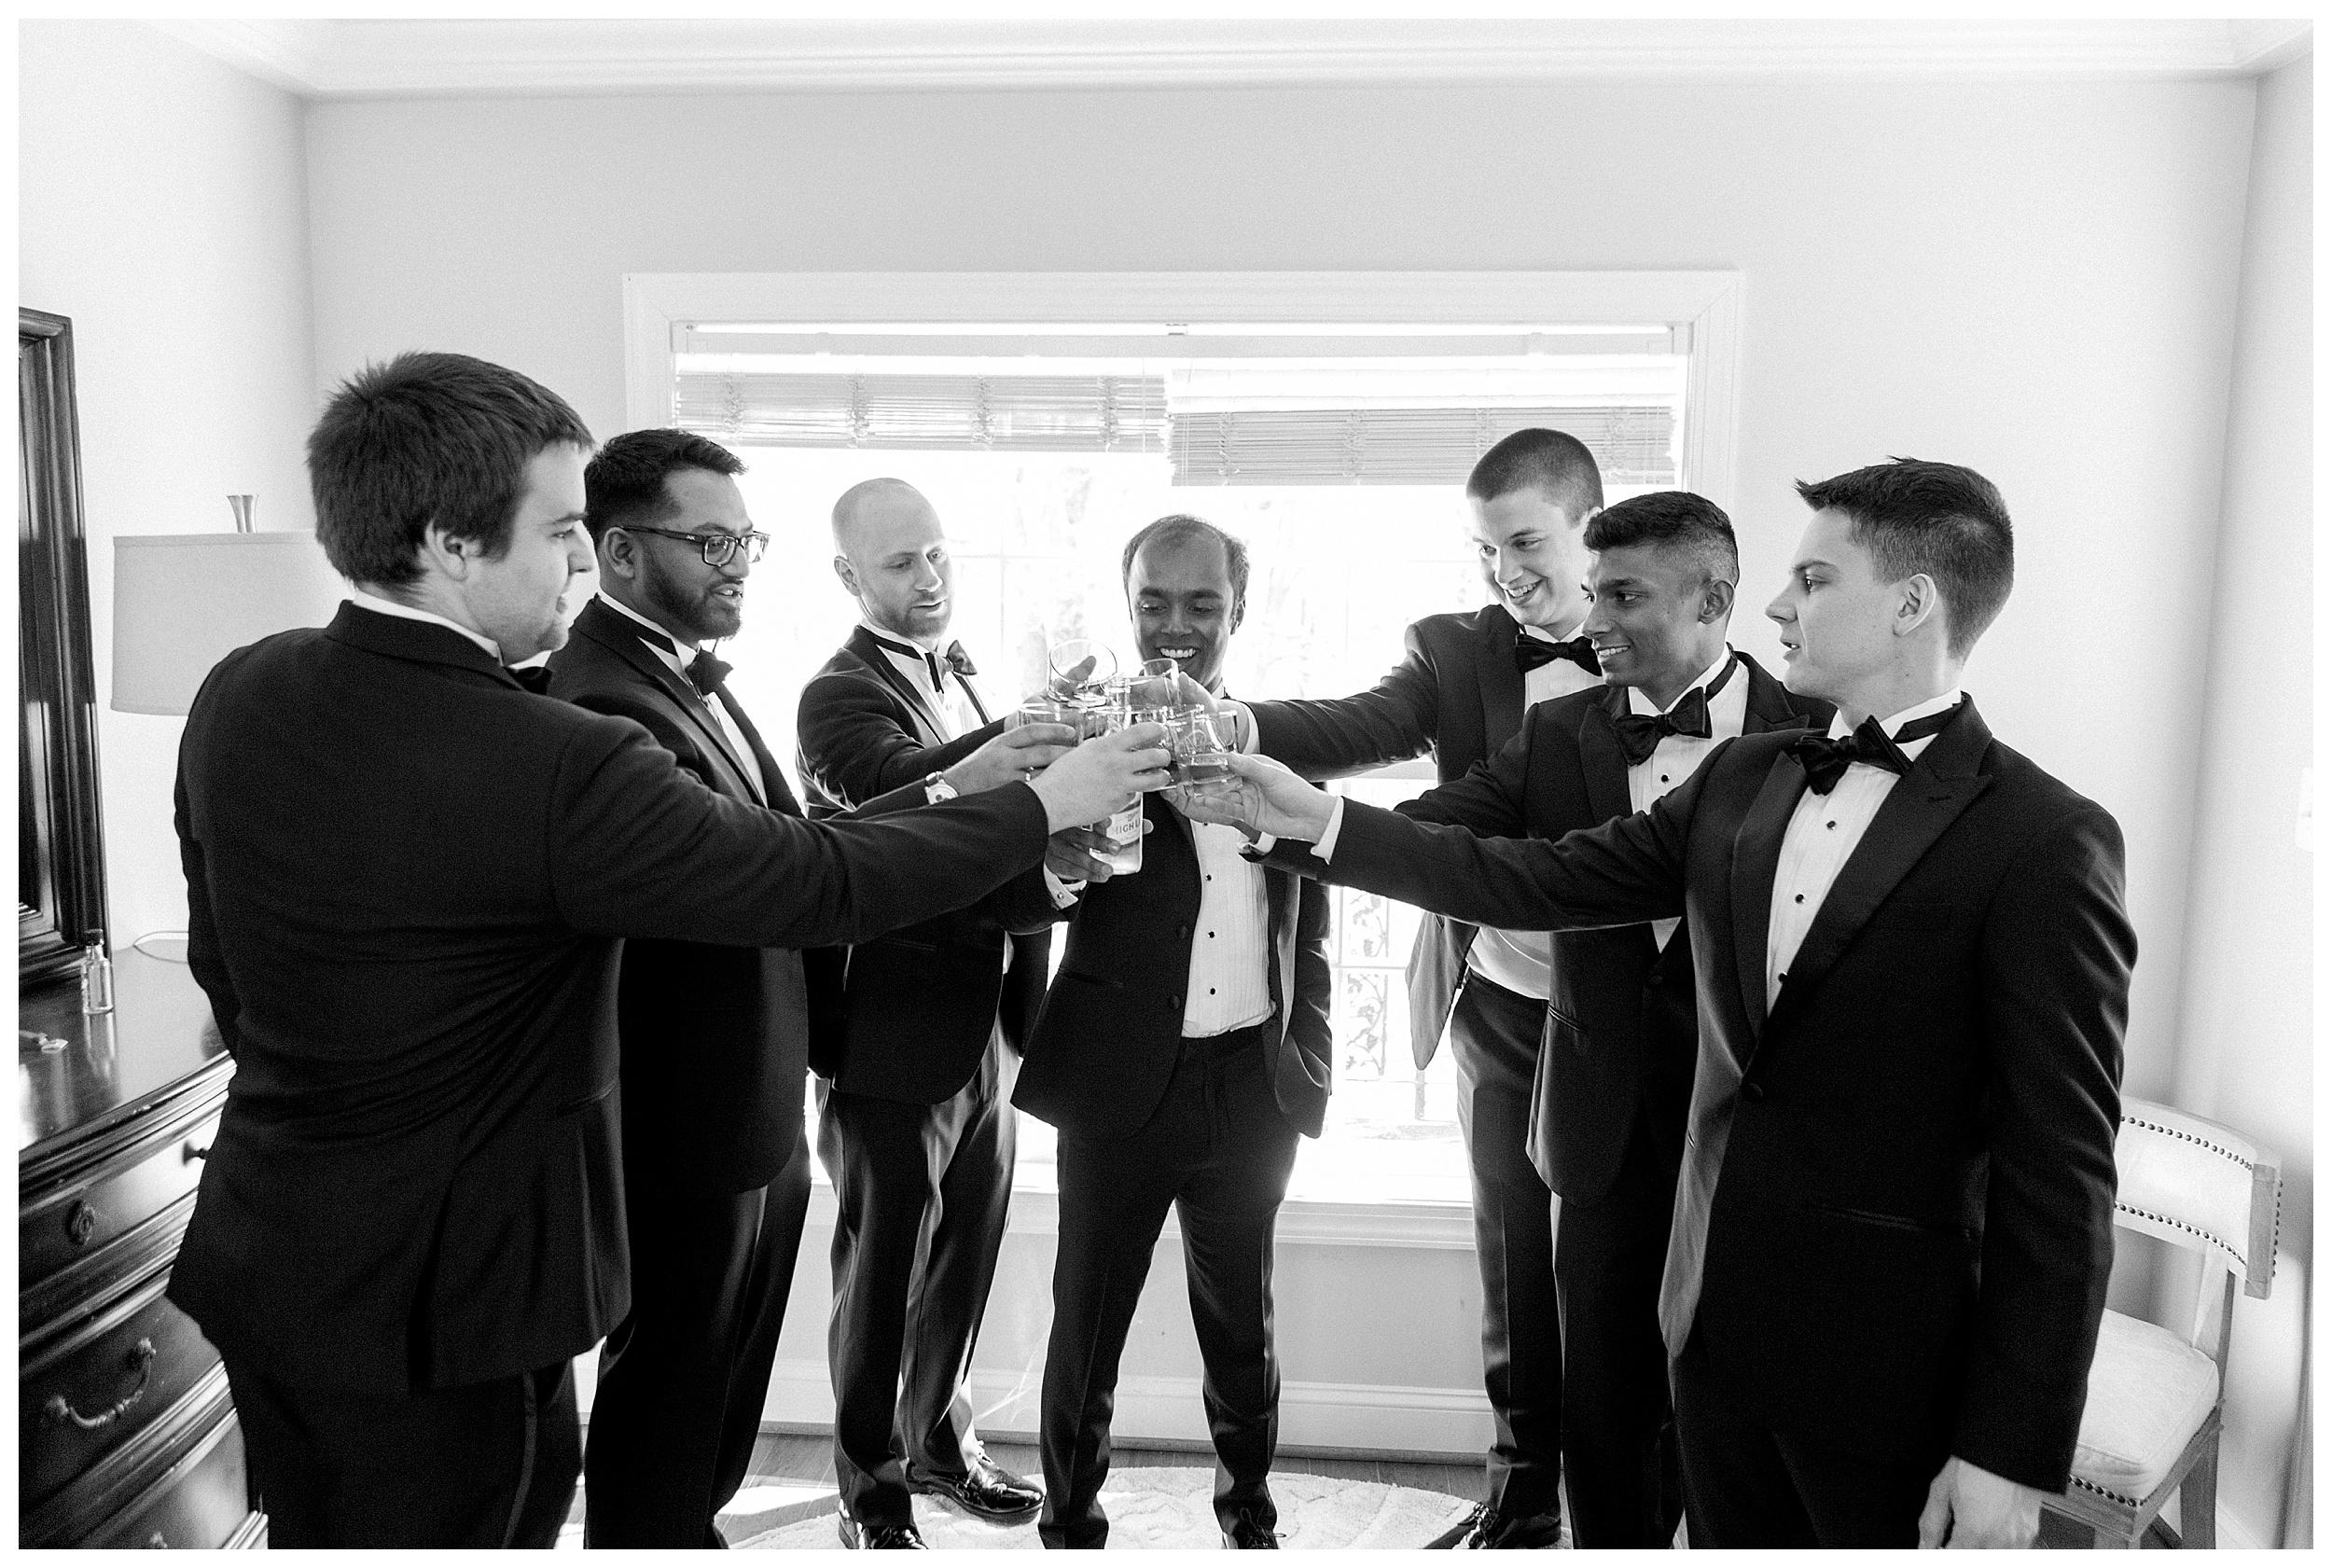 Stone Tower Winery Wedding | Virginia Winter Wedding | VA Wedding Photographer Kir Tuben_0033.jpg